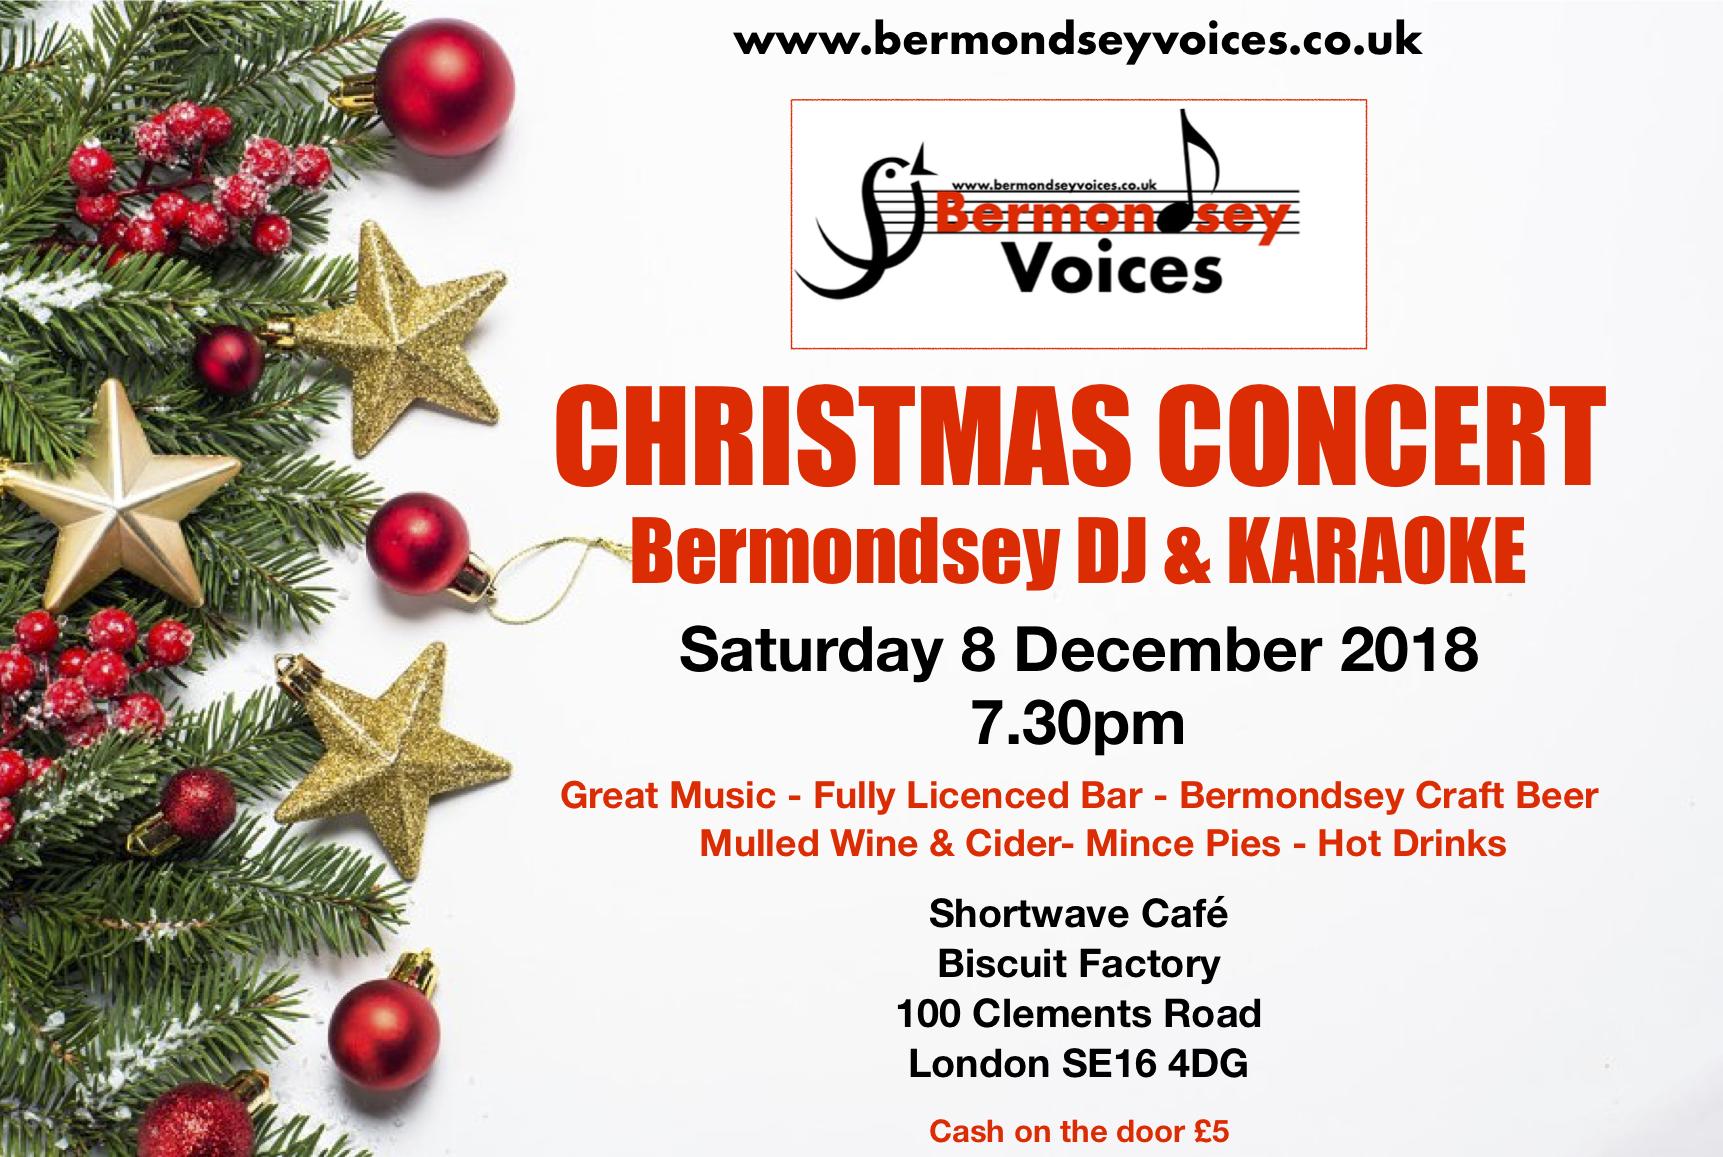 Christmas Concert JPEG 2018 Bermondsey Voices.jpg